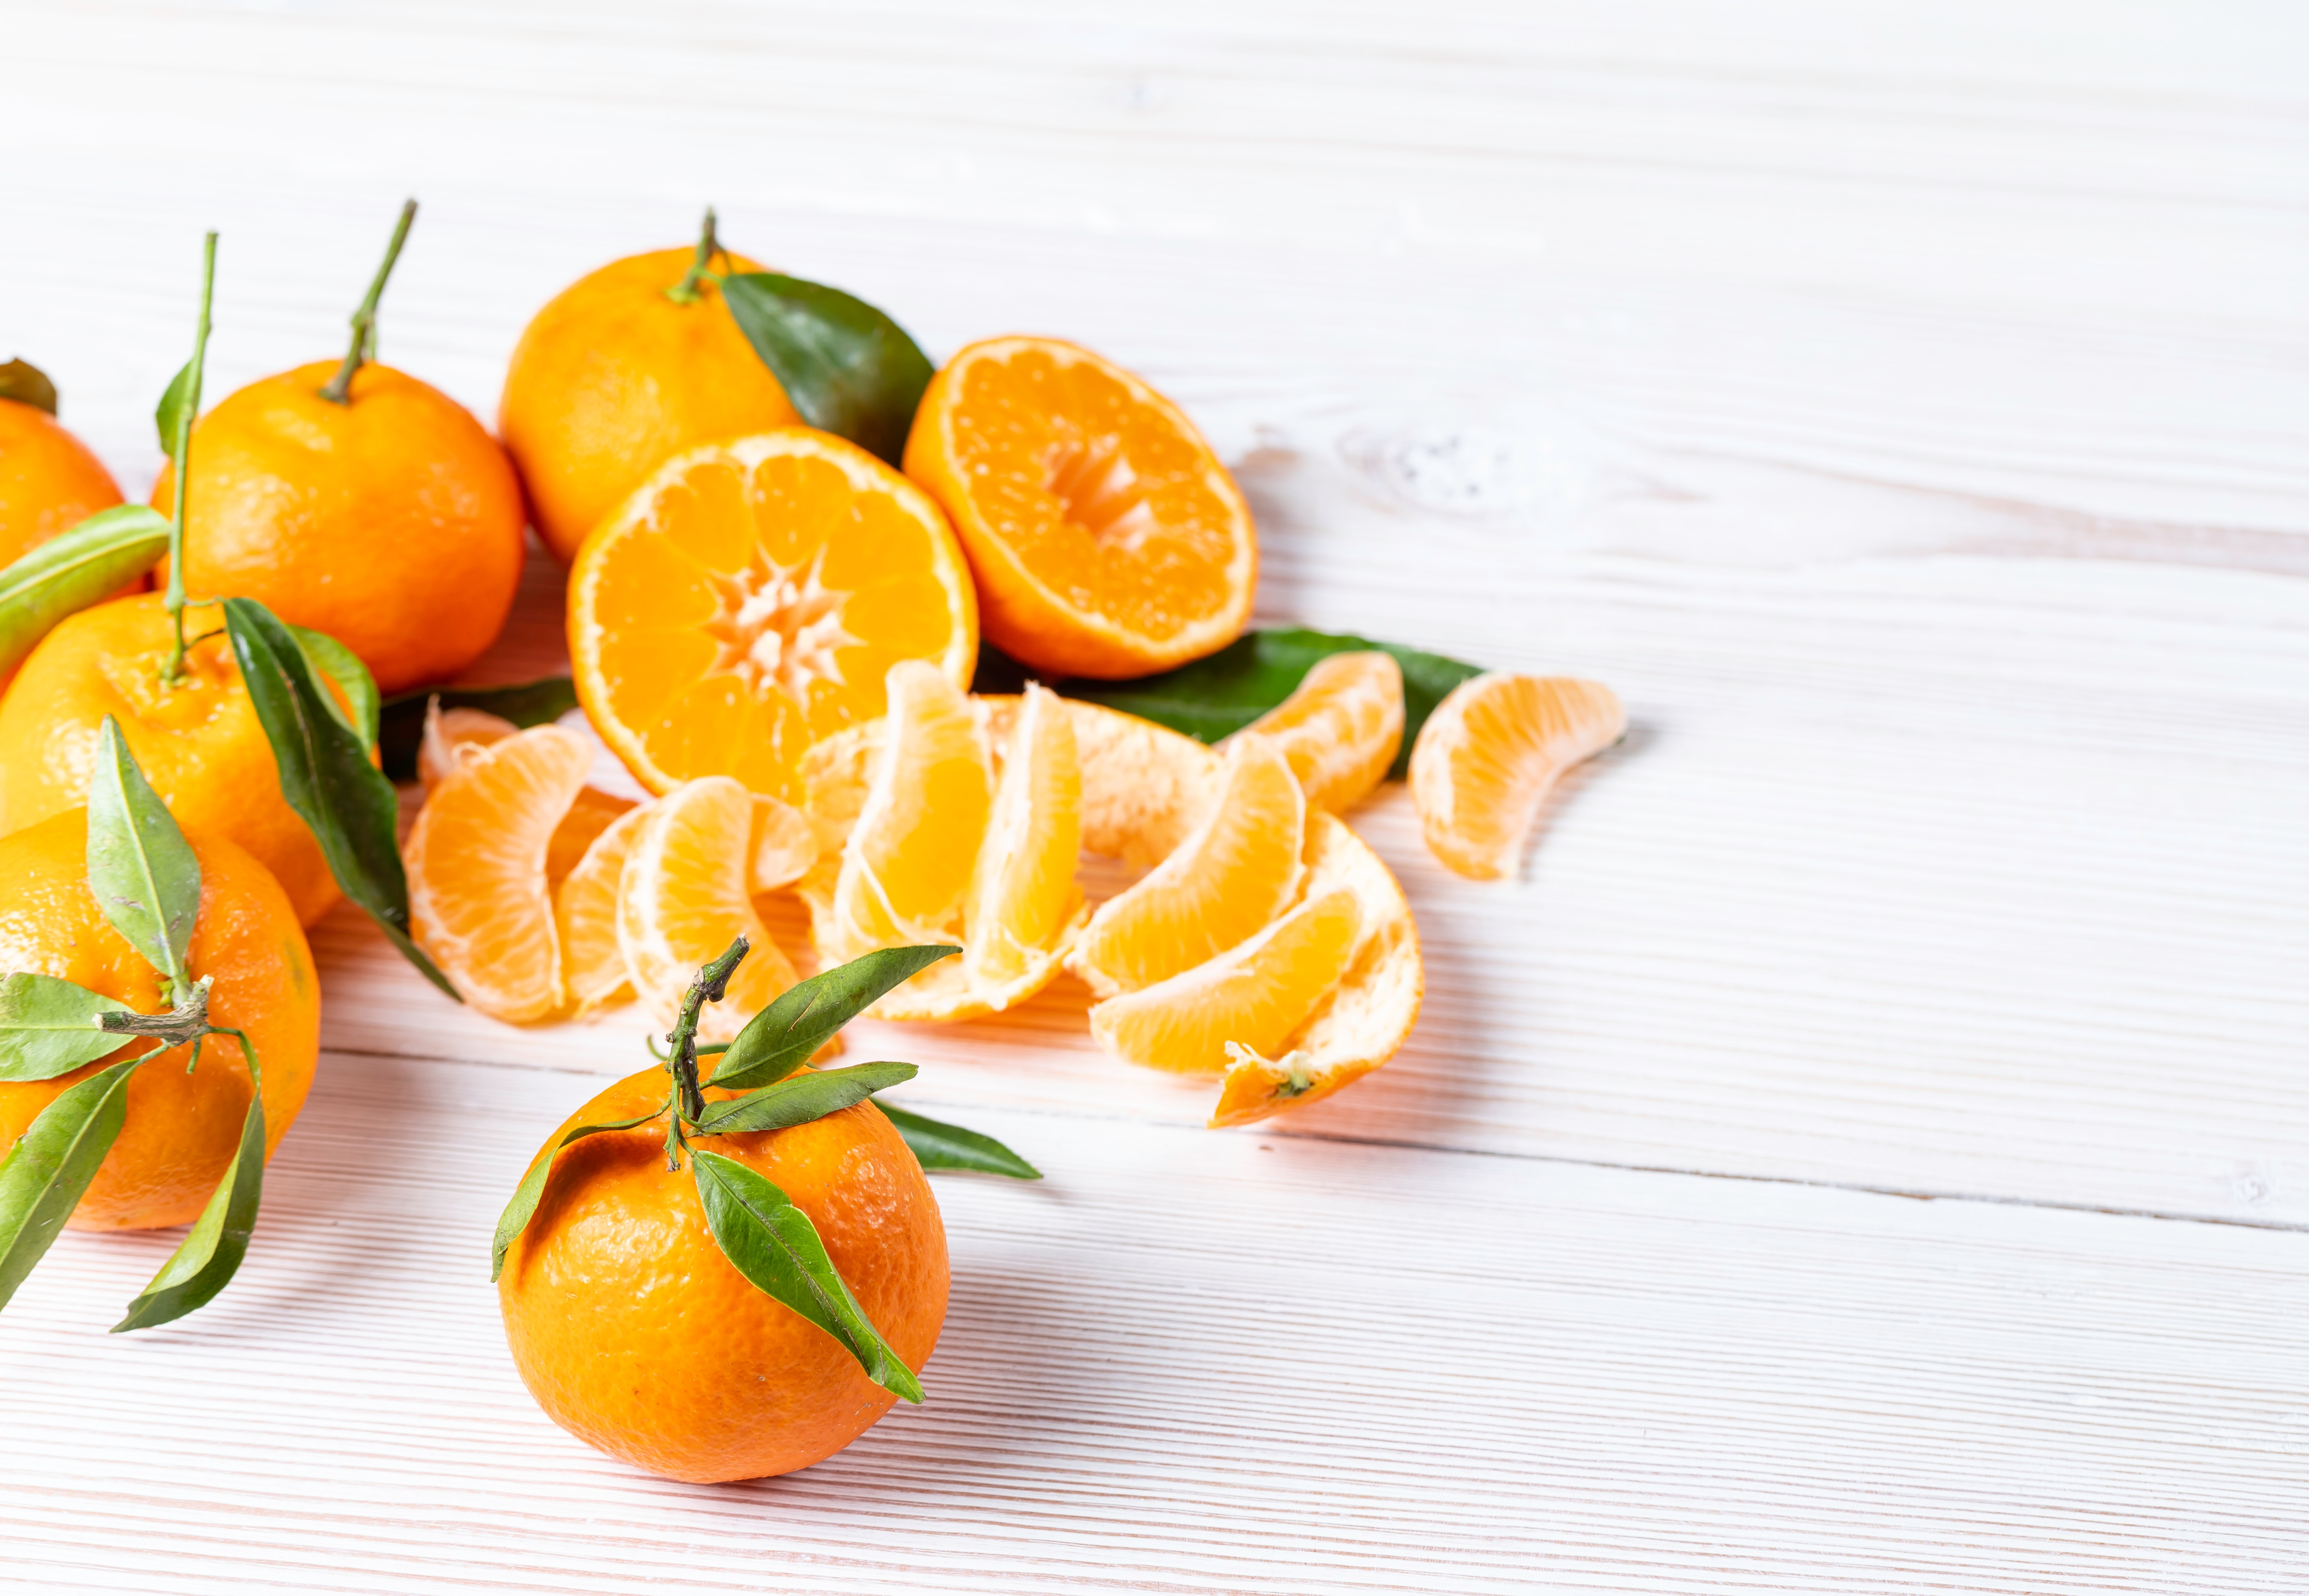 Mandarini al cioccolato fondente